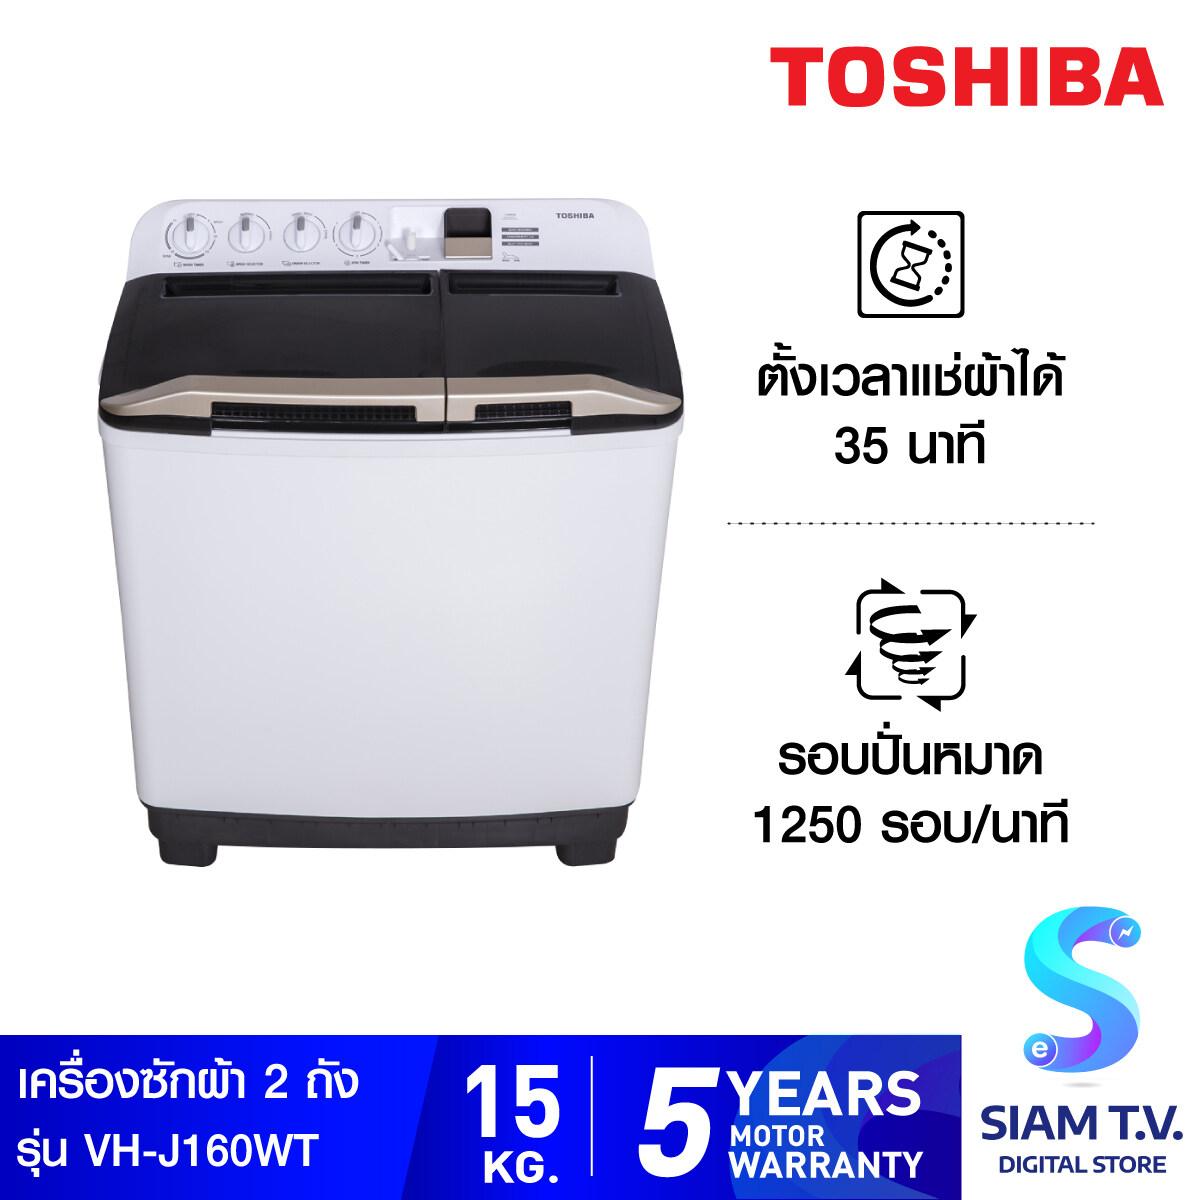 Toshiba เครื่องซักผ้า 2 ถัง ขนาด 15 กก. VH-J160WT สีขาว โดย สยามทีวี by Siam T.V.